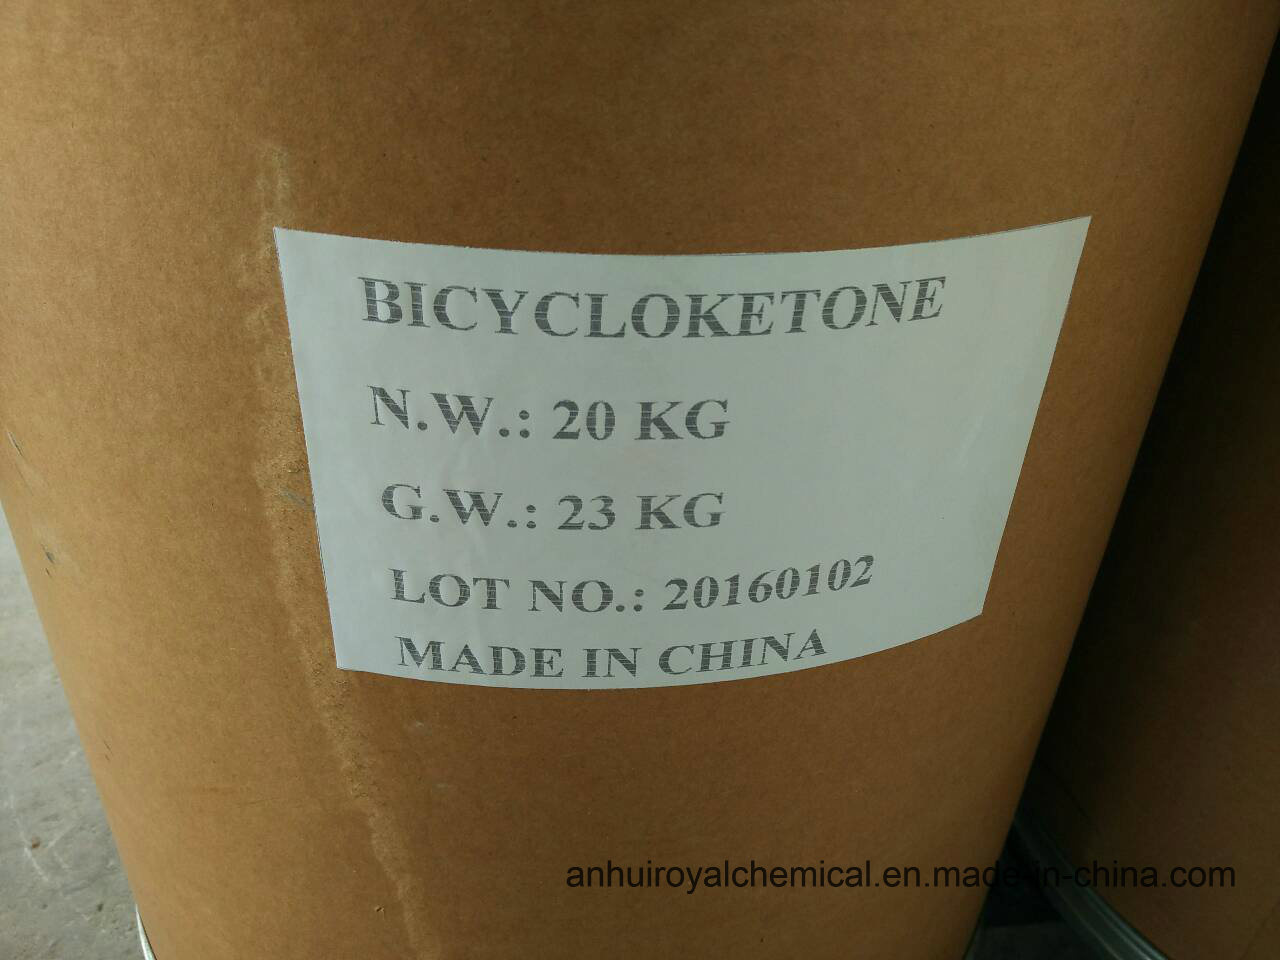 Bck Bicyclo Ketone CAS No. 74288-40-7